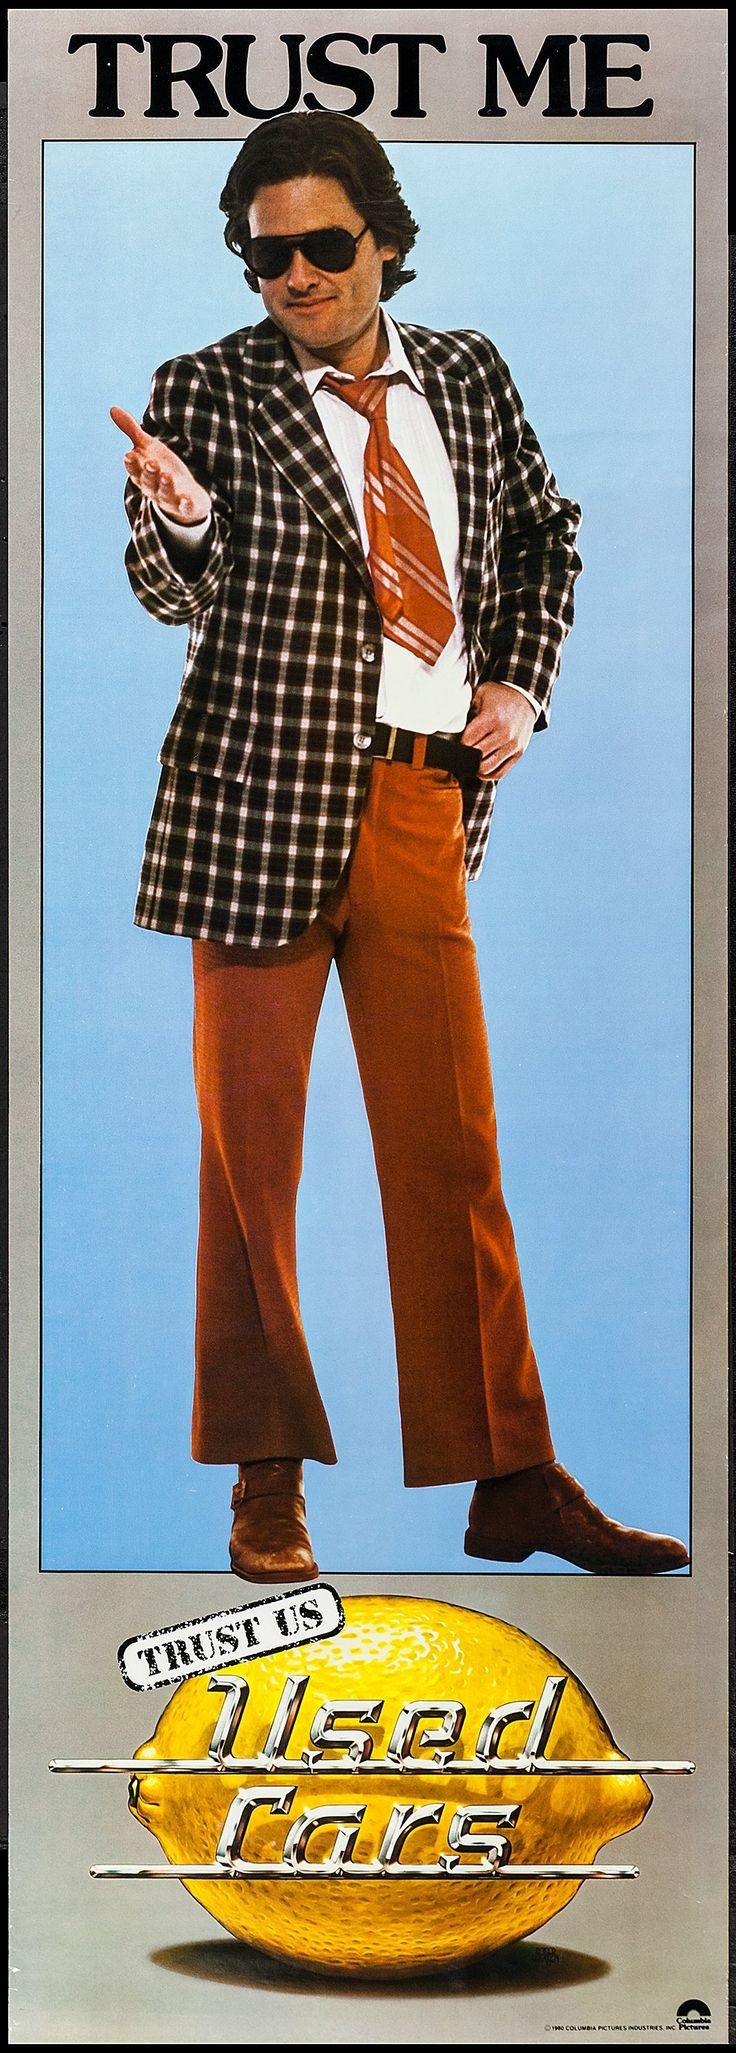 Used Cars (1980) Stars: Kurt Russell, Jack Warden, Gerrit Graham, Frank McRae, Deborah Harmon, Joe Flaherty ~ Director: Robert Zemeckis